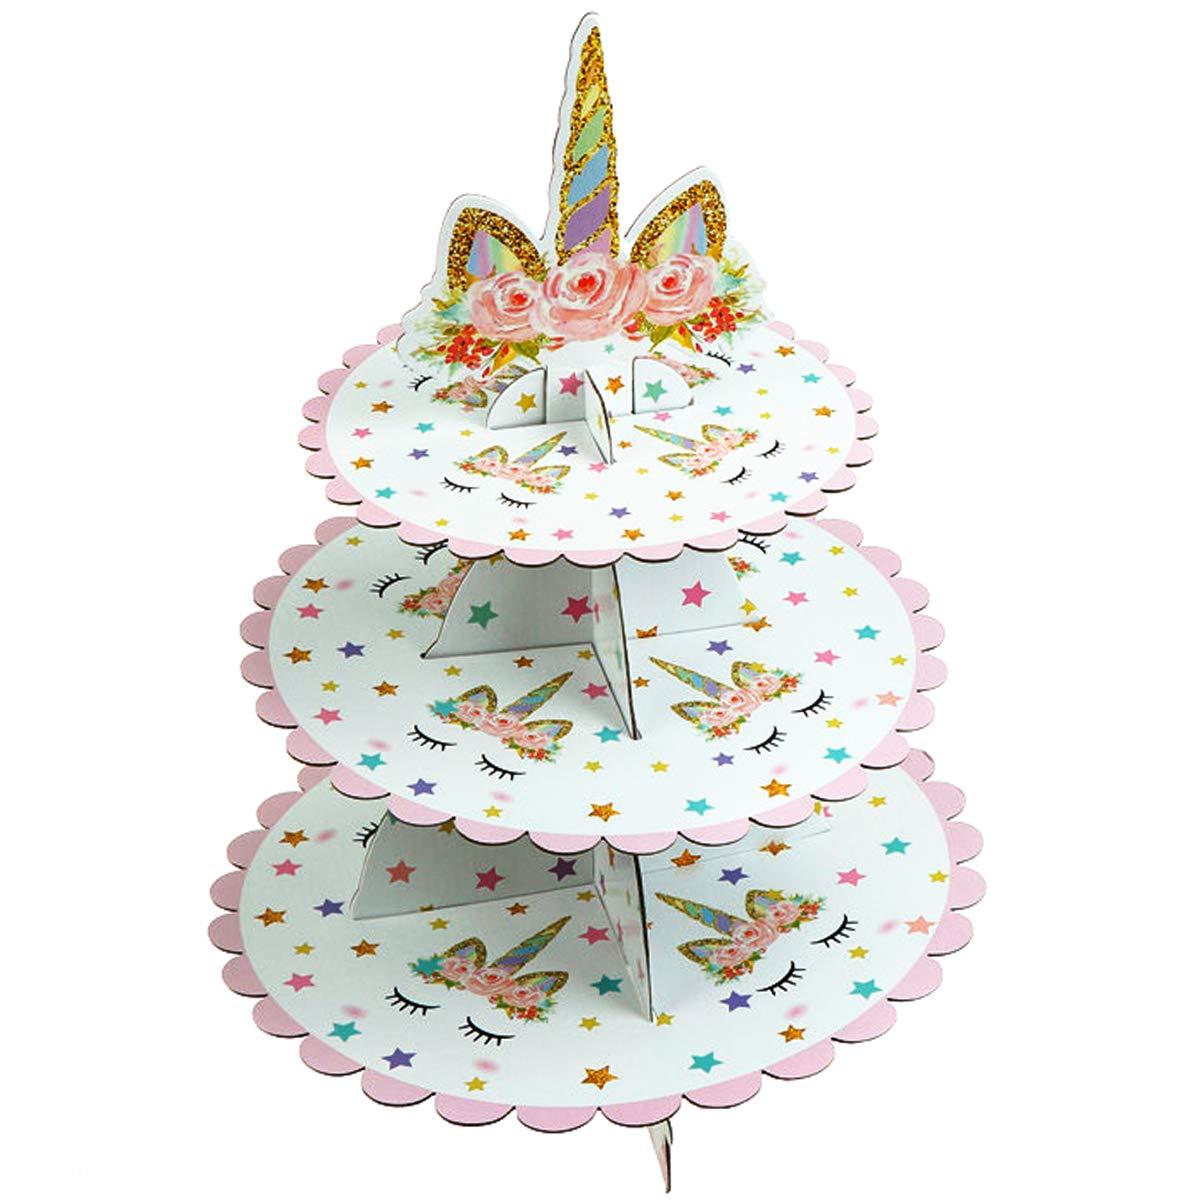 JETTINGBUY 3段ユニコーン段ボールカップケーキスタンド デザートカップケーキホルダー ベビーシャワー用 性別披露宴 子供の誕生日パーティー ユニコーンテーマパーティー   B07DVYQZRC